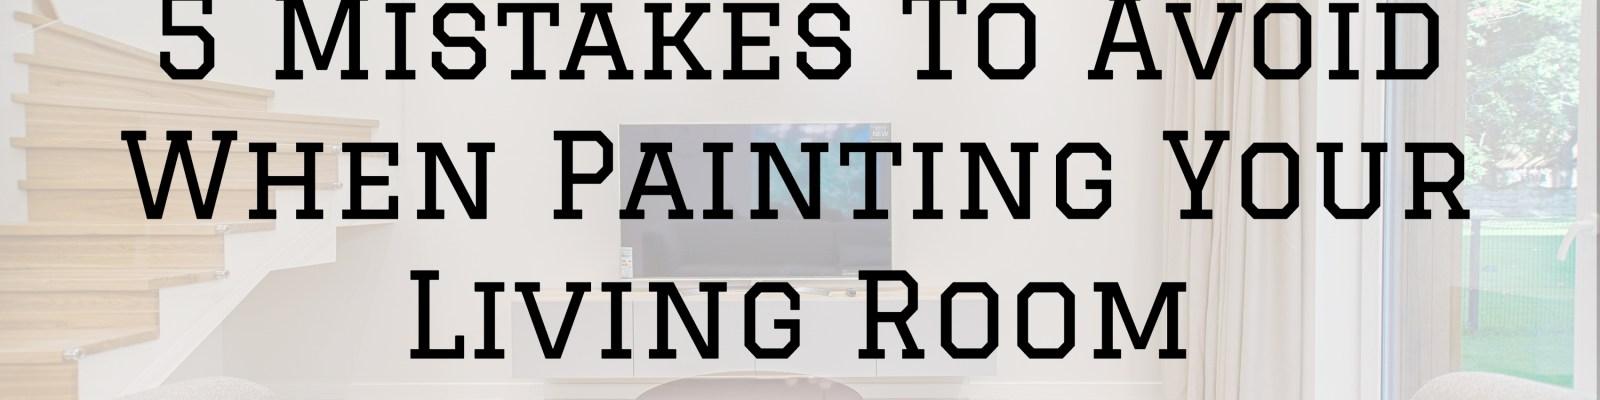 2020-10-23 Selah Painting St. Louis MO Avoid Mistakes Painting Living Room